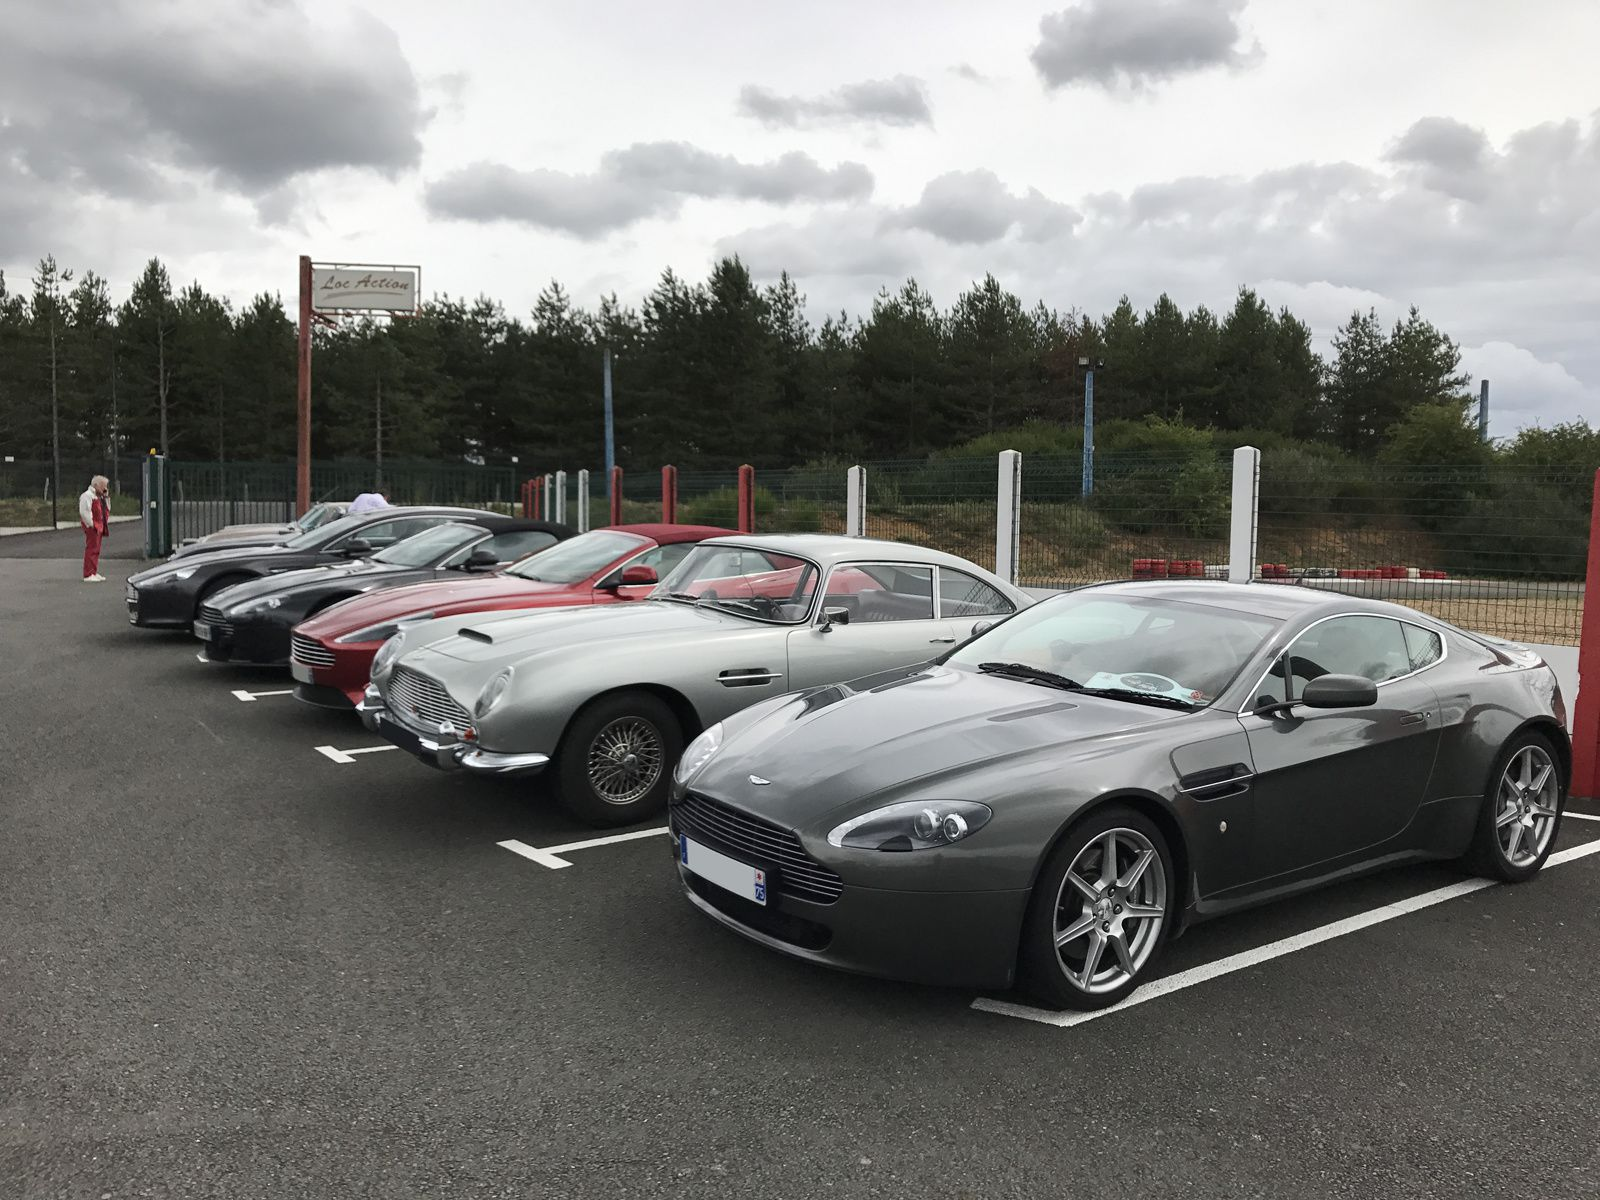 Rallye de l'Hôtel de France 2017